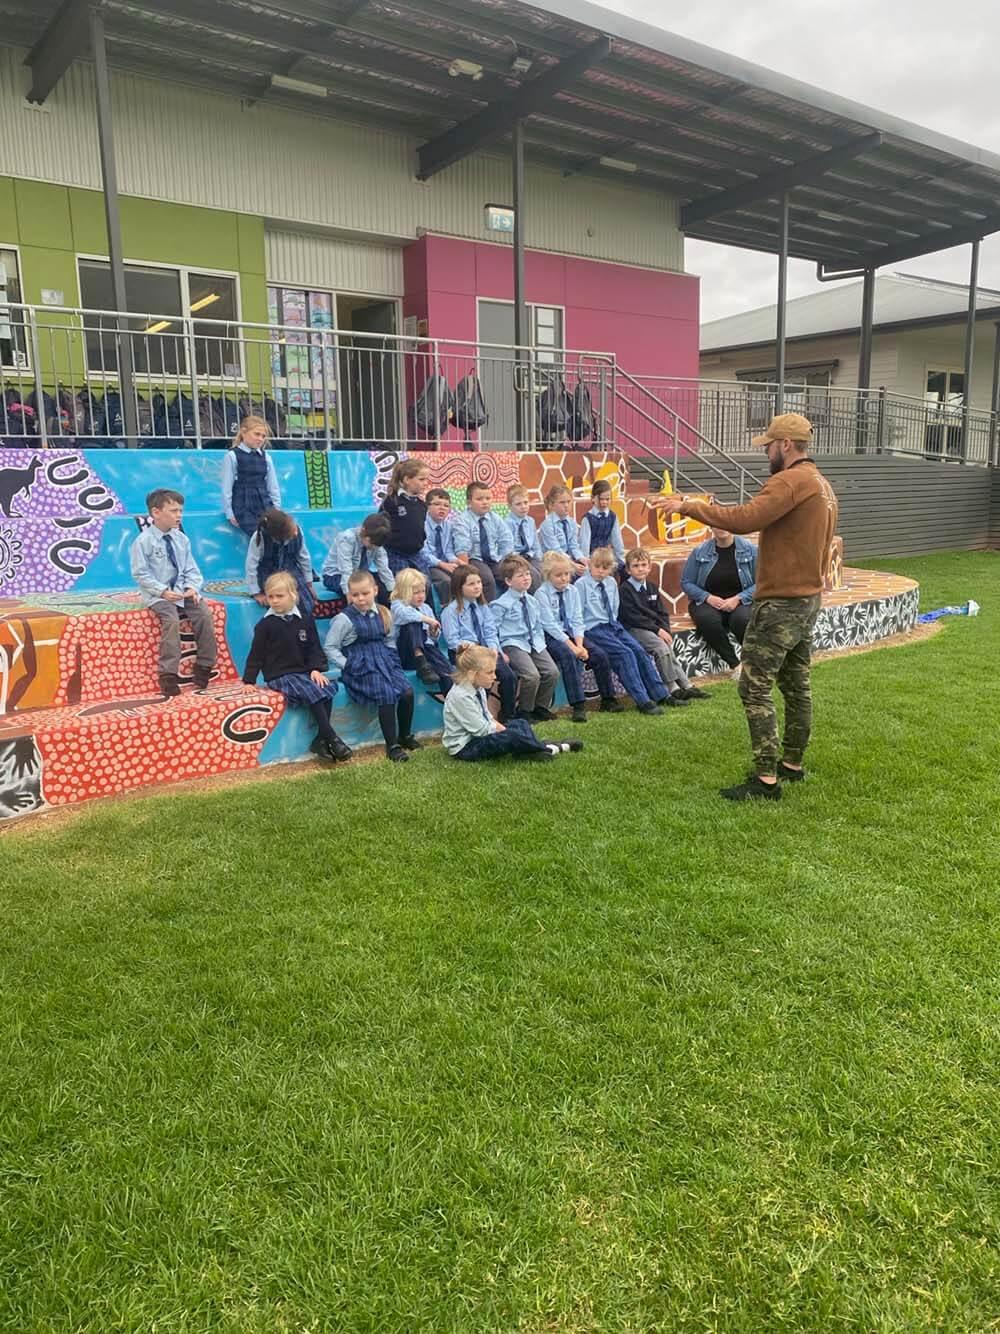 Hunter Barnes teaching a group of kids